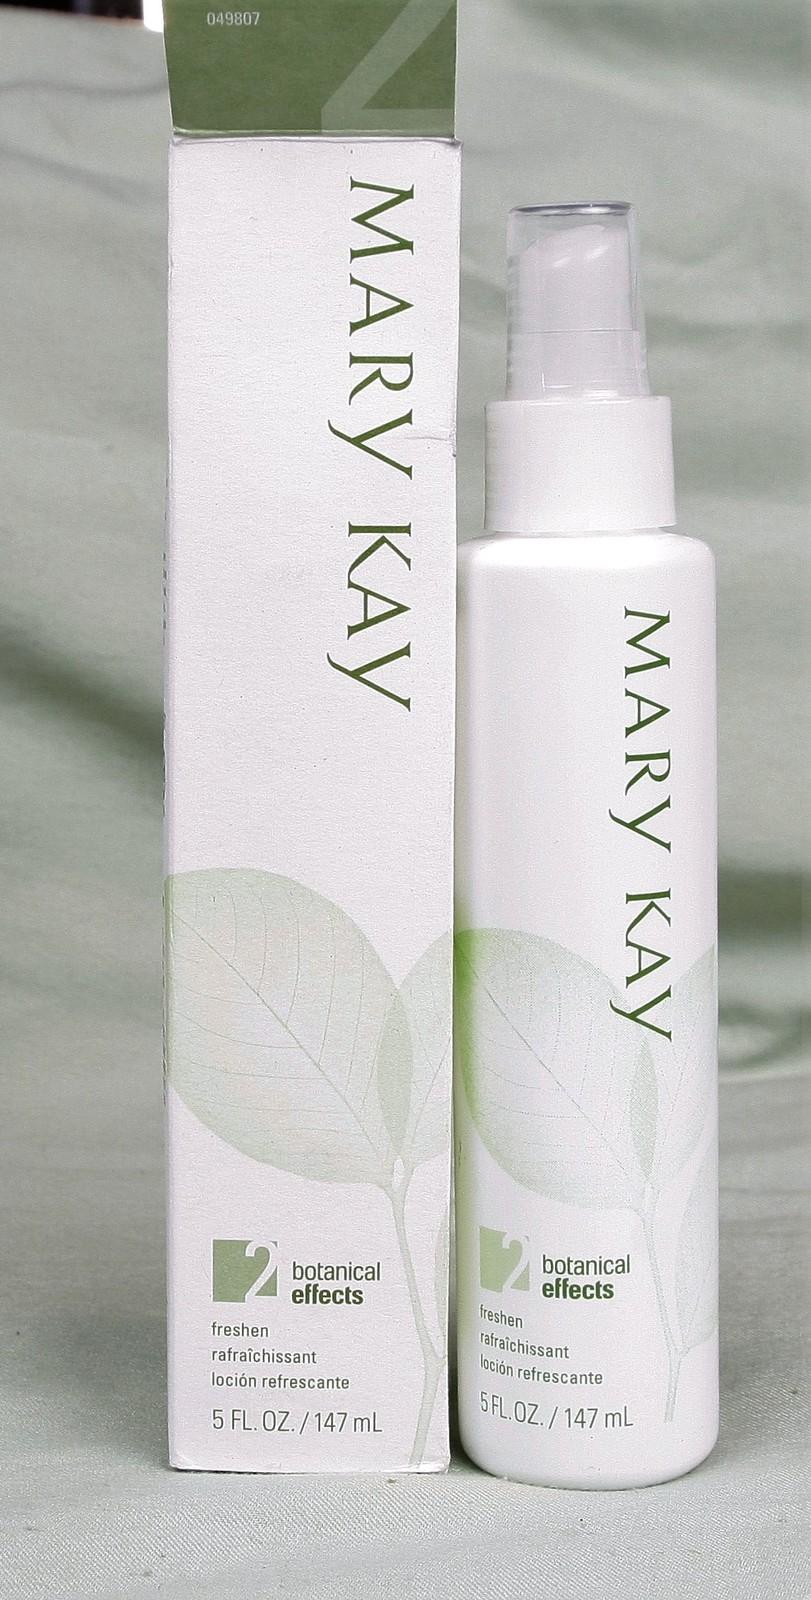 Mary Kay Botanical Effects Freshen Formula 2 (Normal Skin) 5 fl. oz.  - $17.46